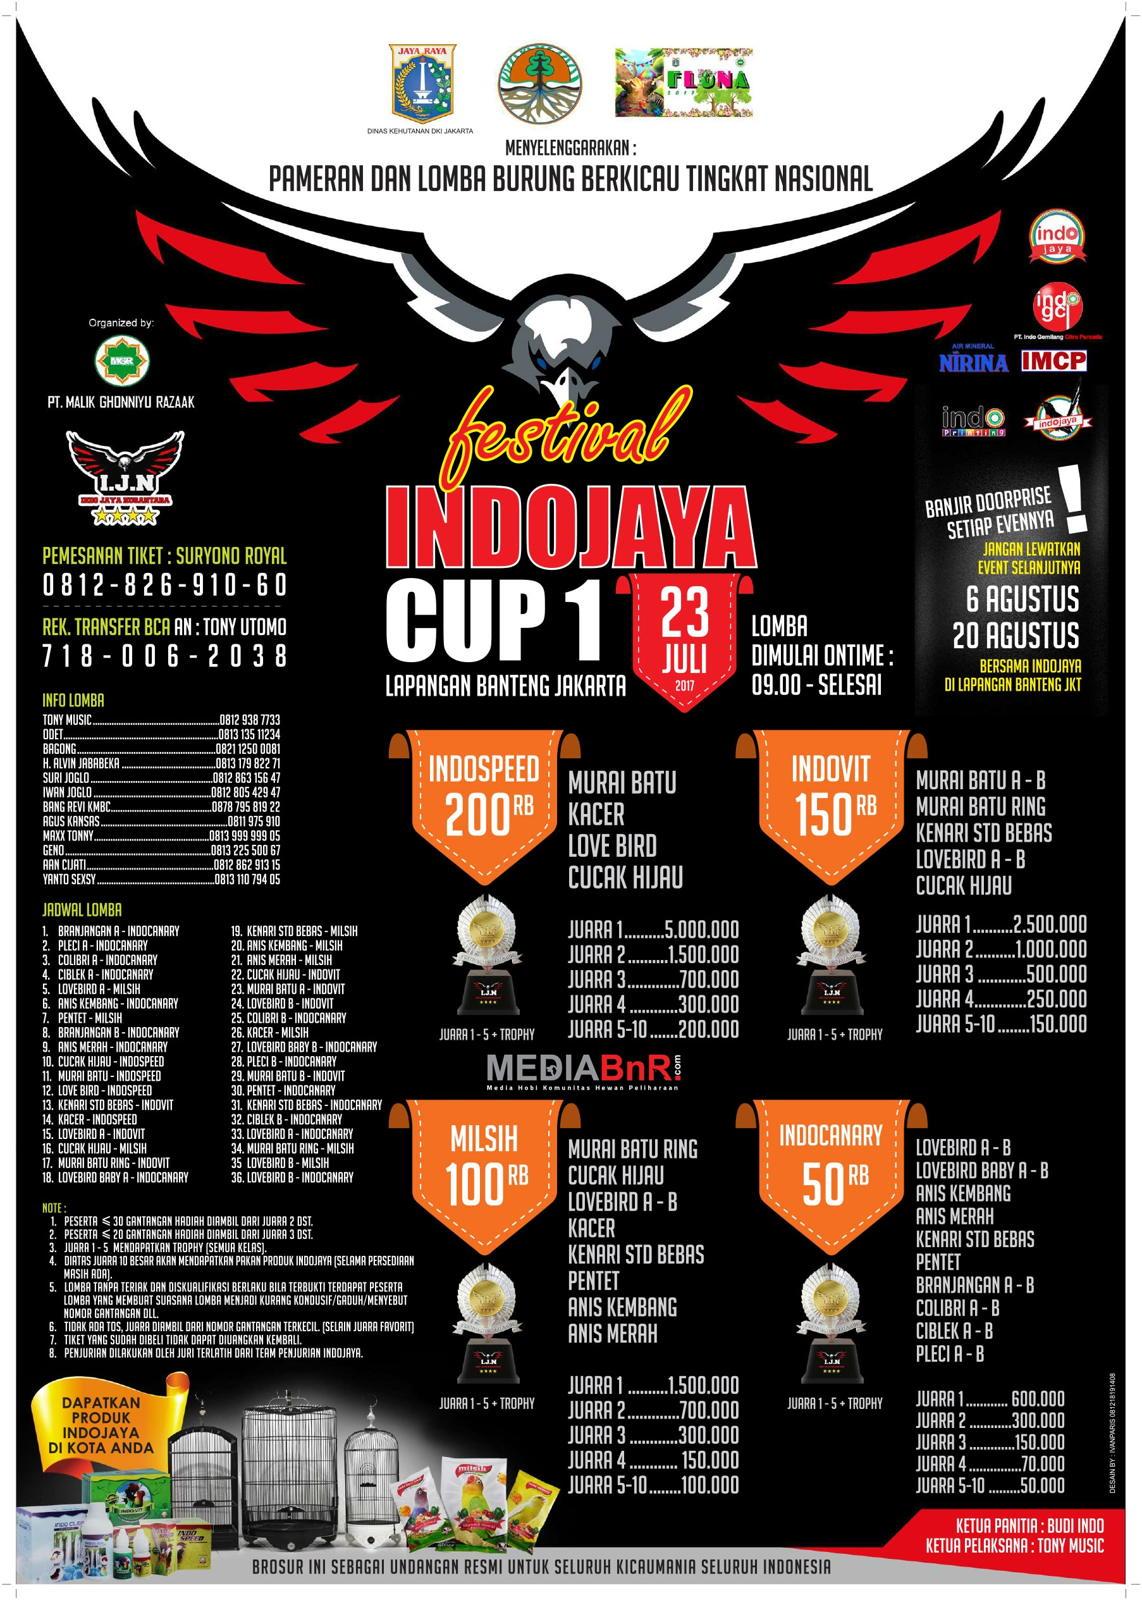 brosur lomba burung berkicau Indo Jaya Cup